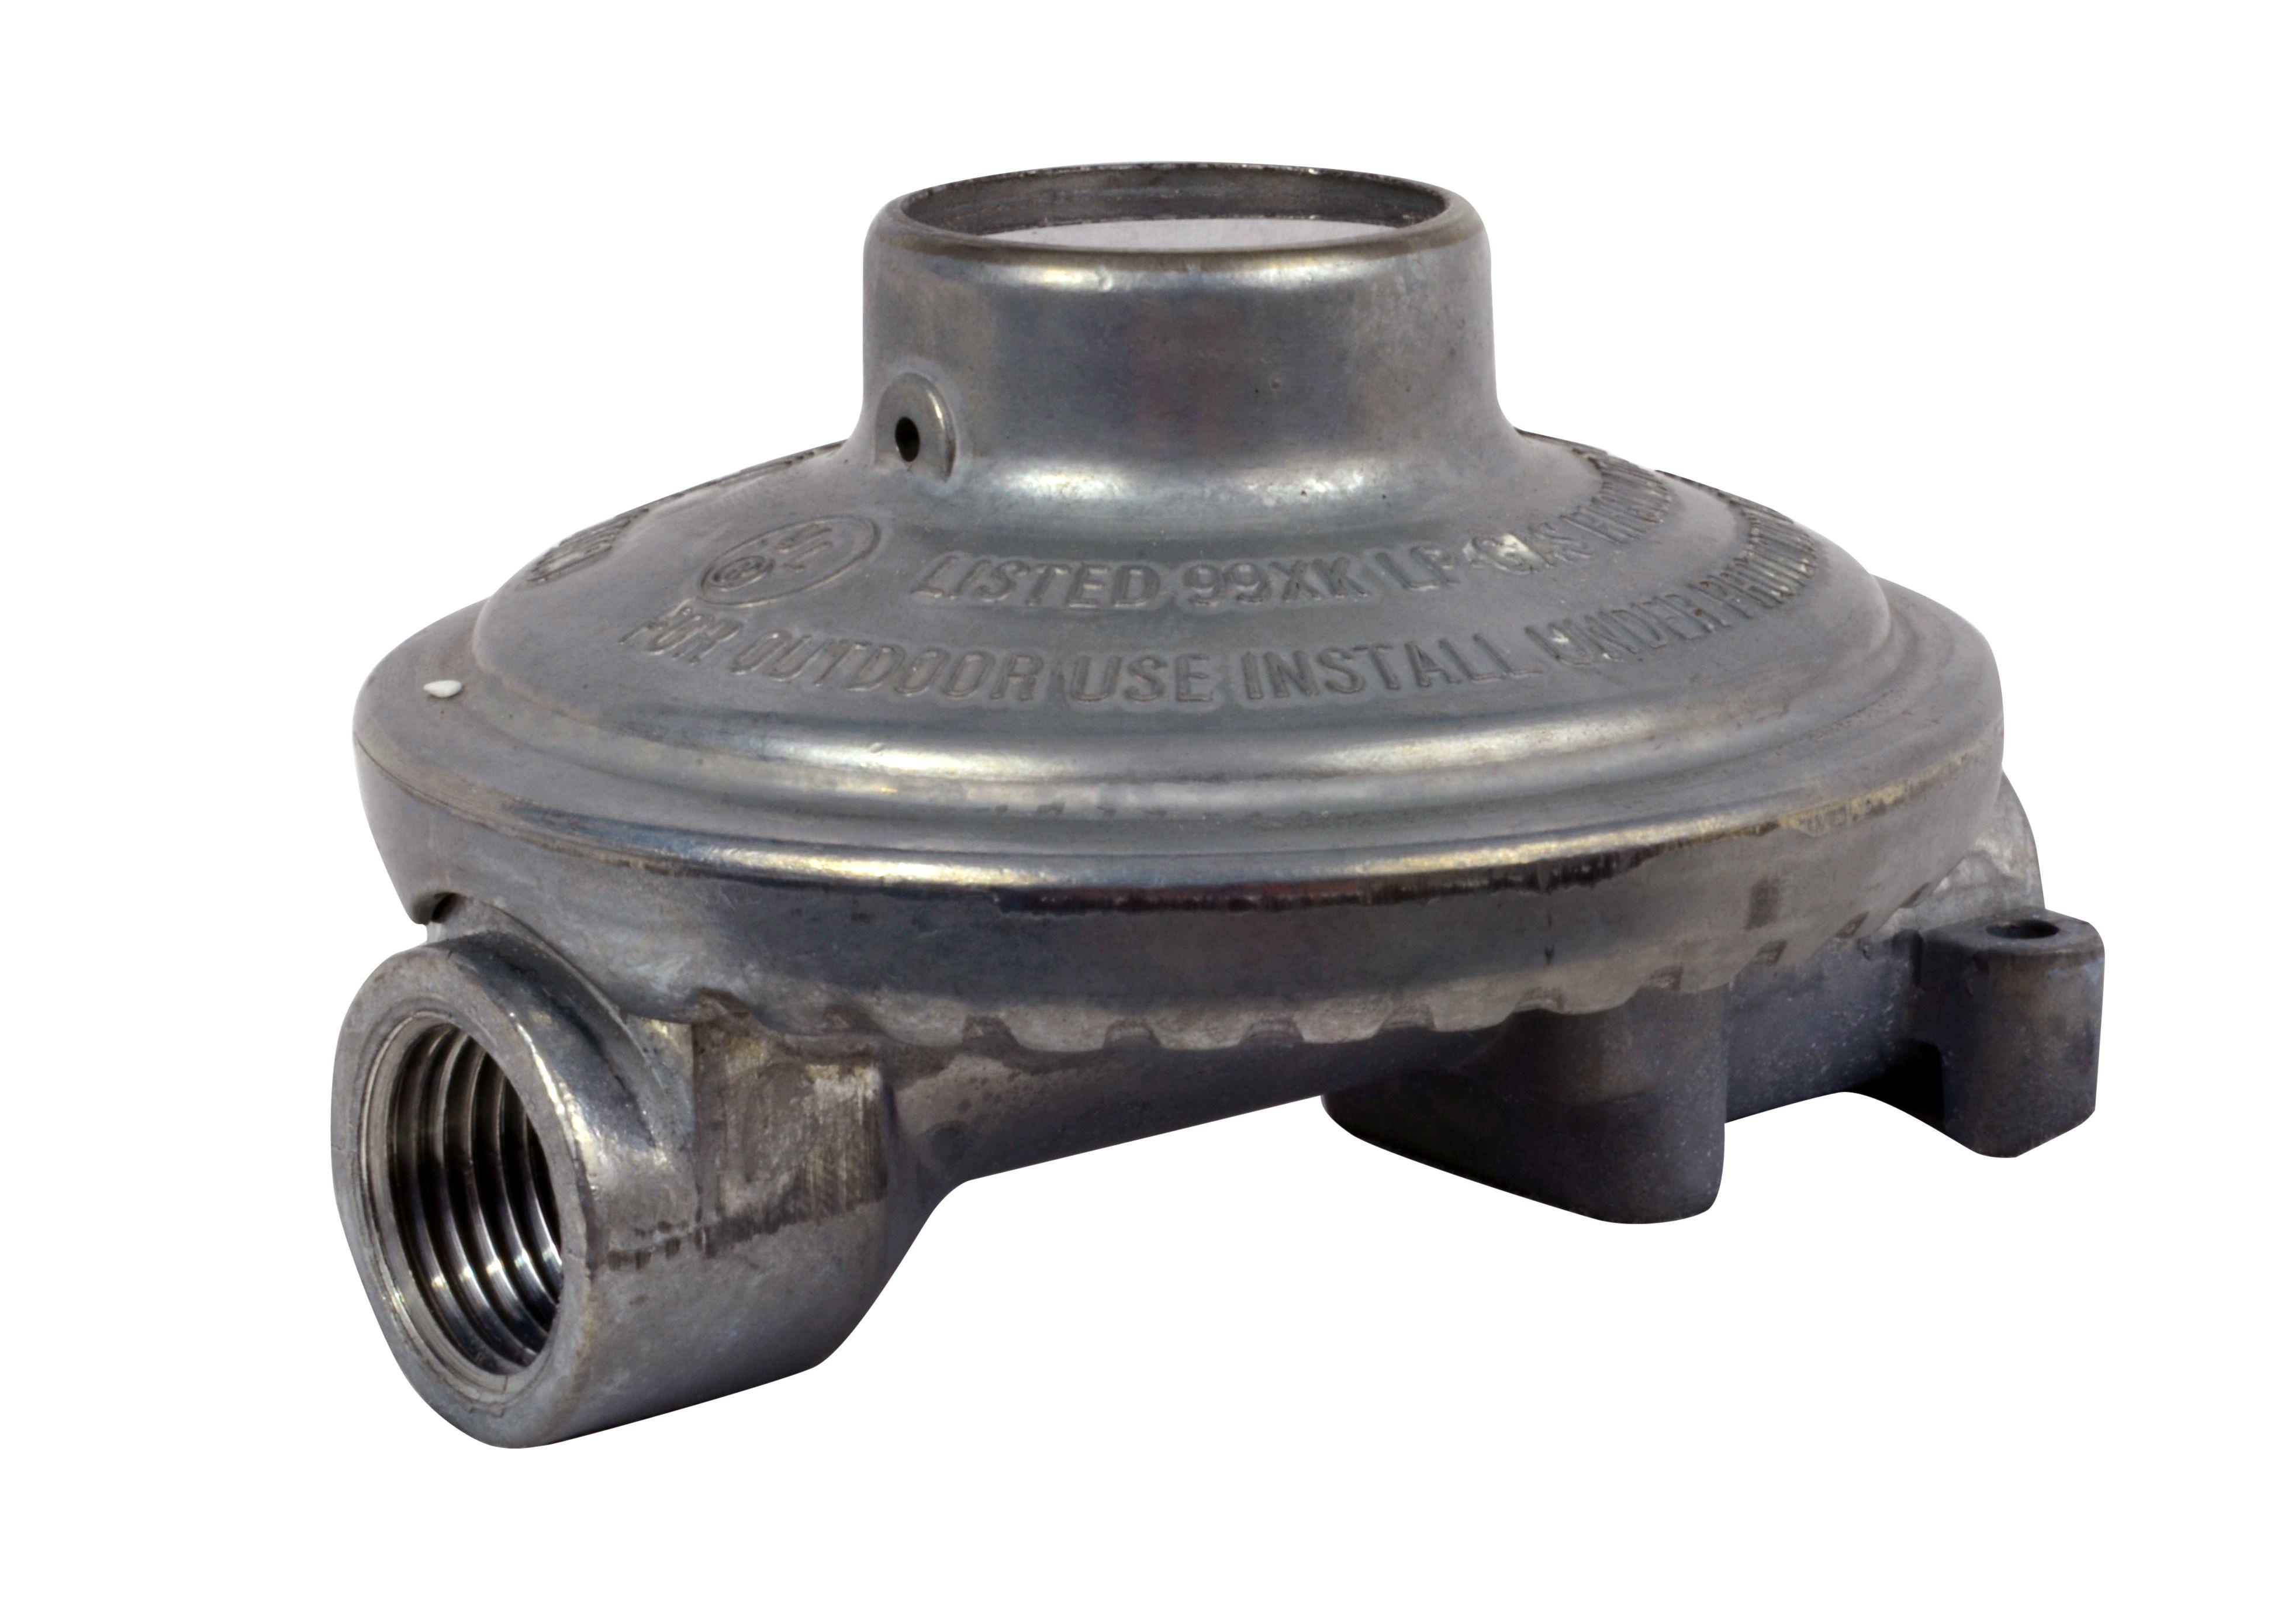 Enerco F173767 Propane Low Pressure Regulator (up to 90k BTU) Clamshell for RV